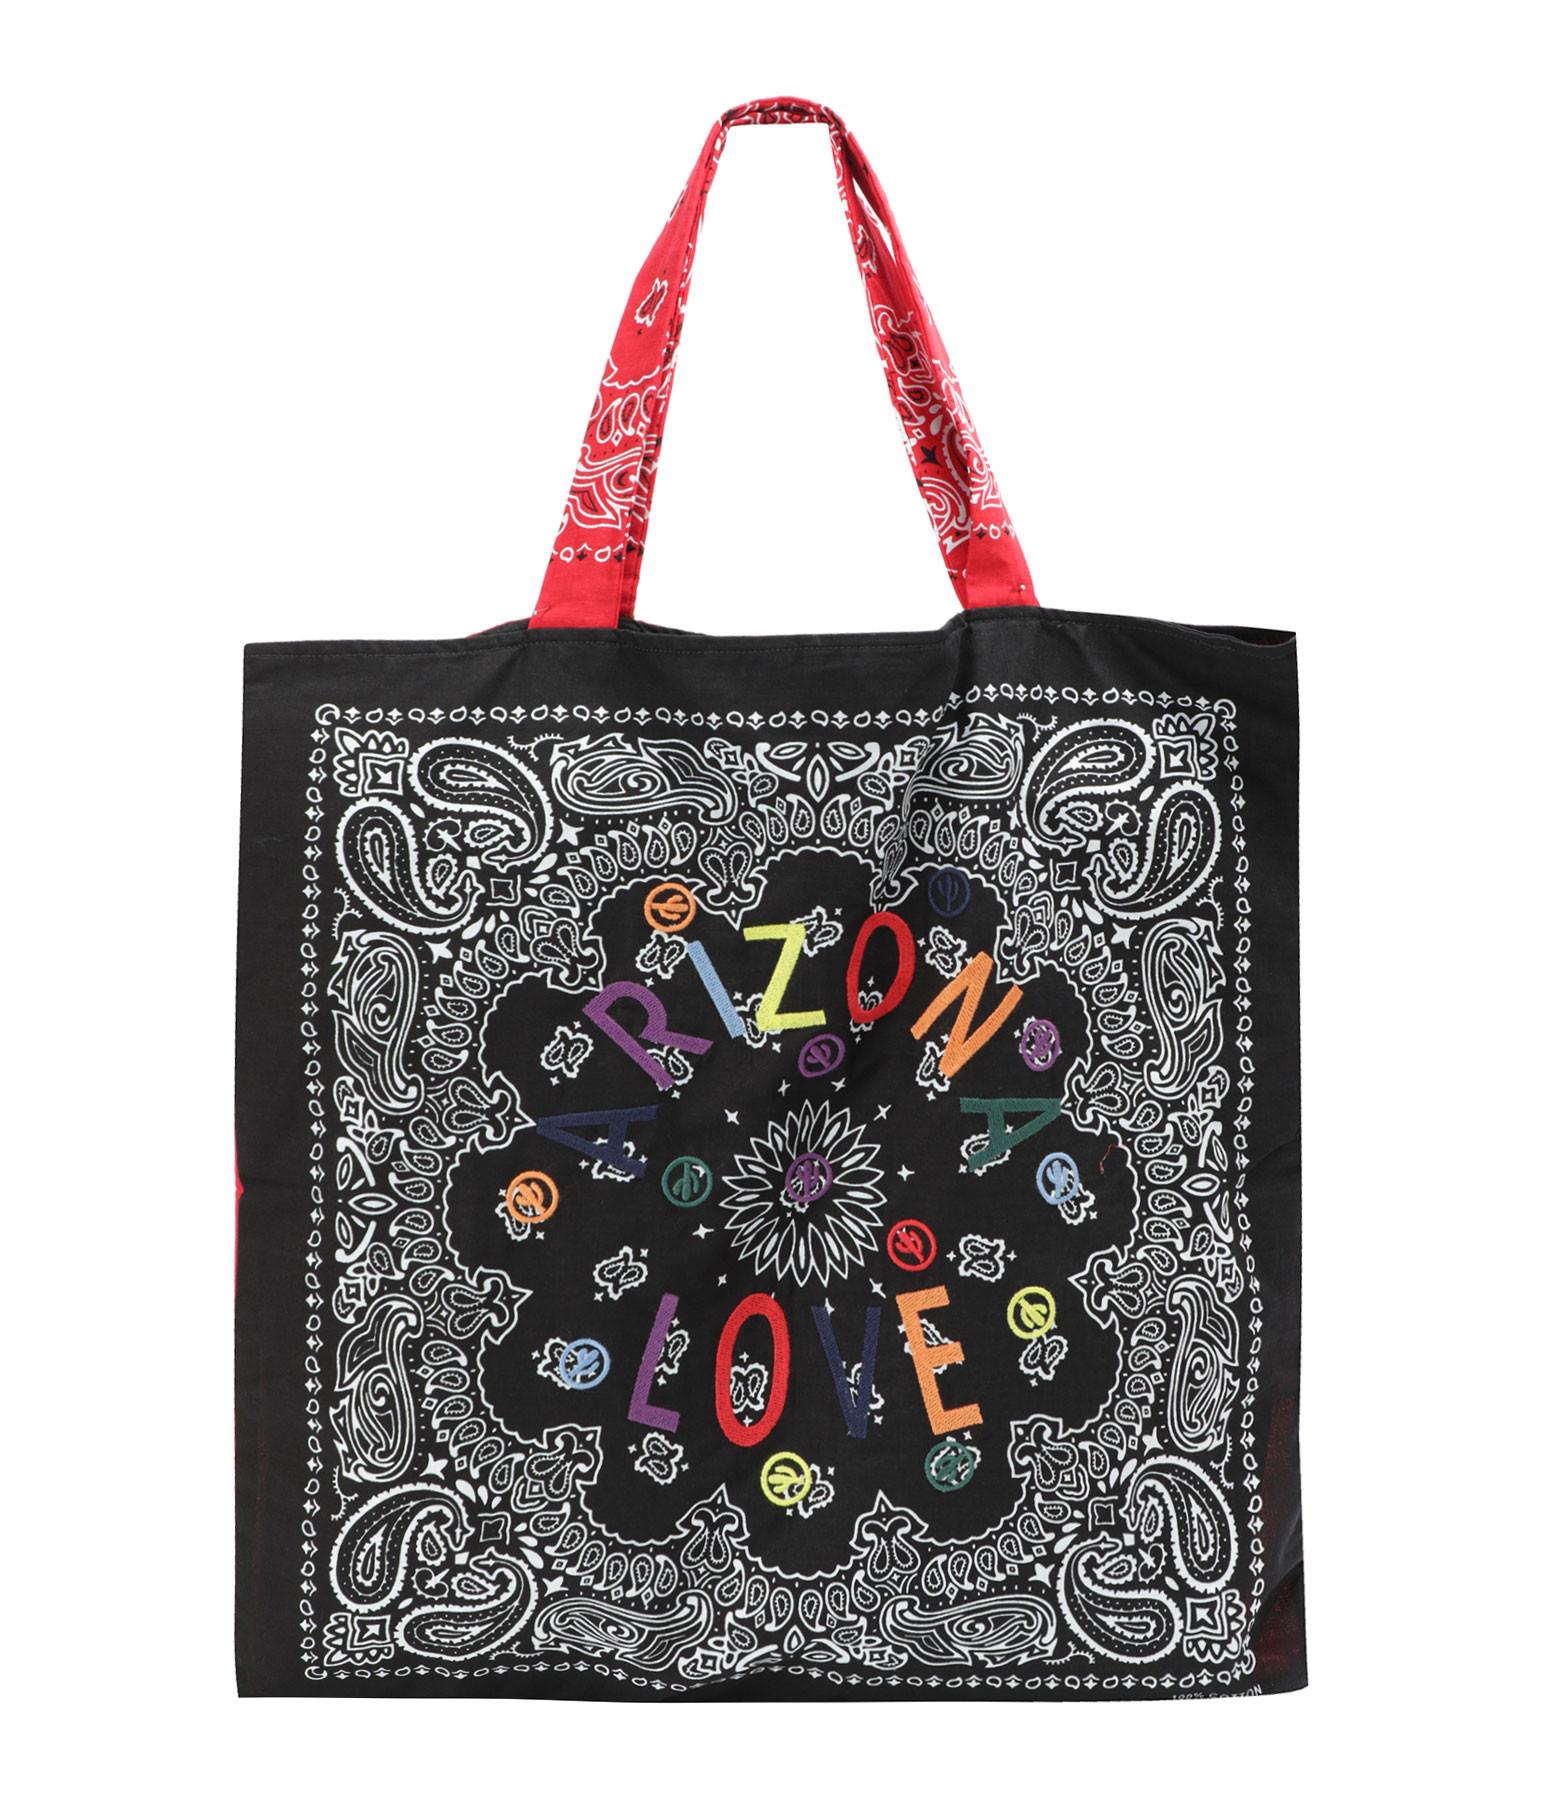 ARIZONA LOVE - Sac Tote Bag Beach Broderie Noir